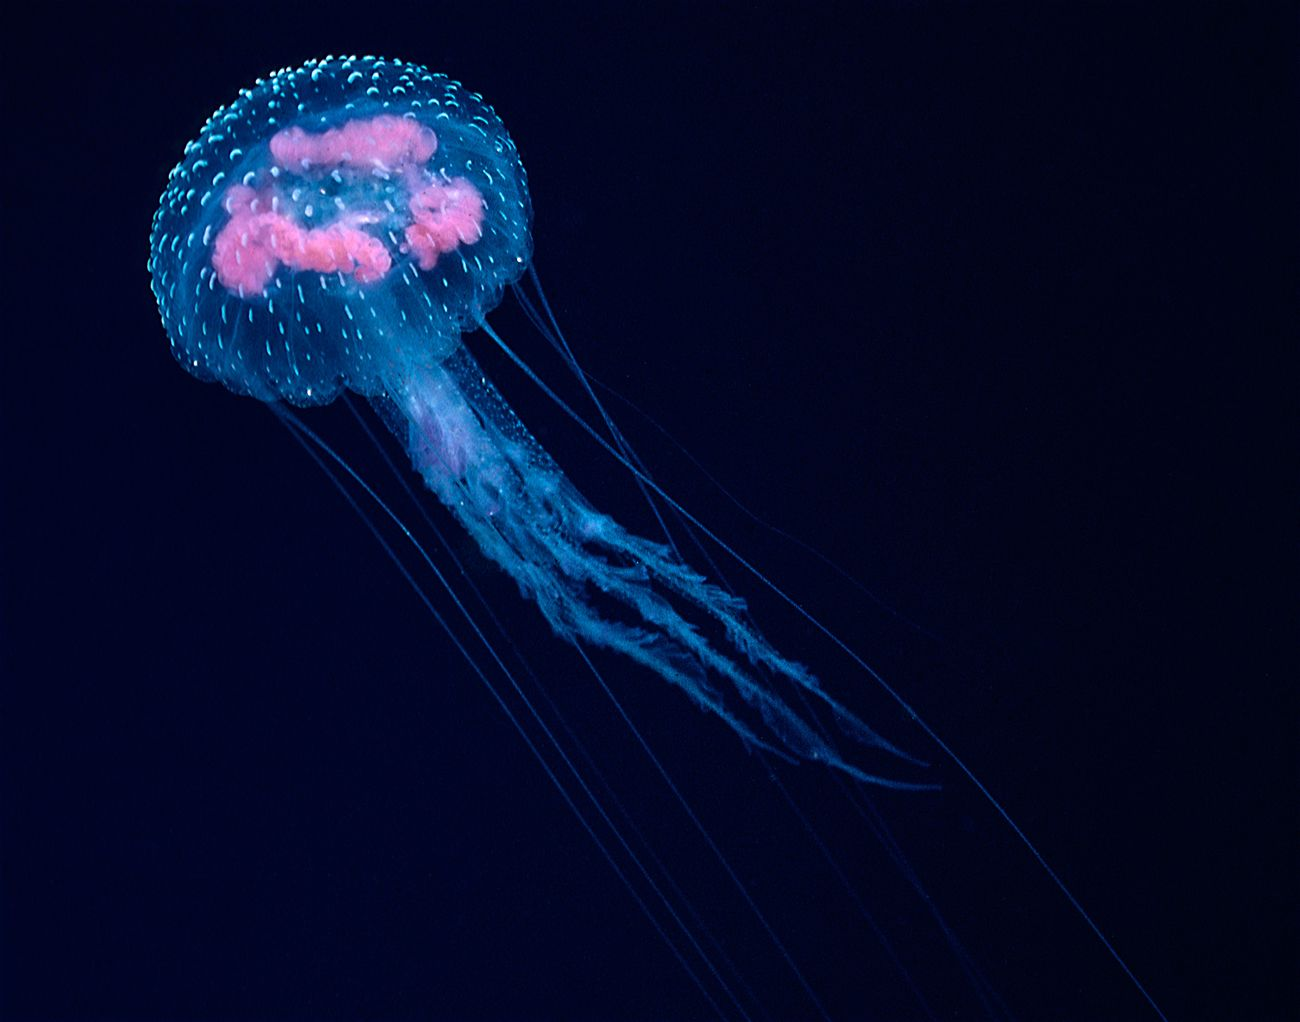 Small Fish Larvae Eggs The Bioluminescent Jellyfish Pelagia